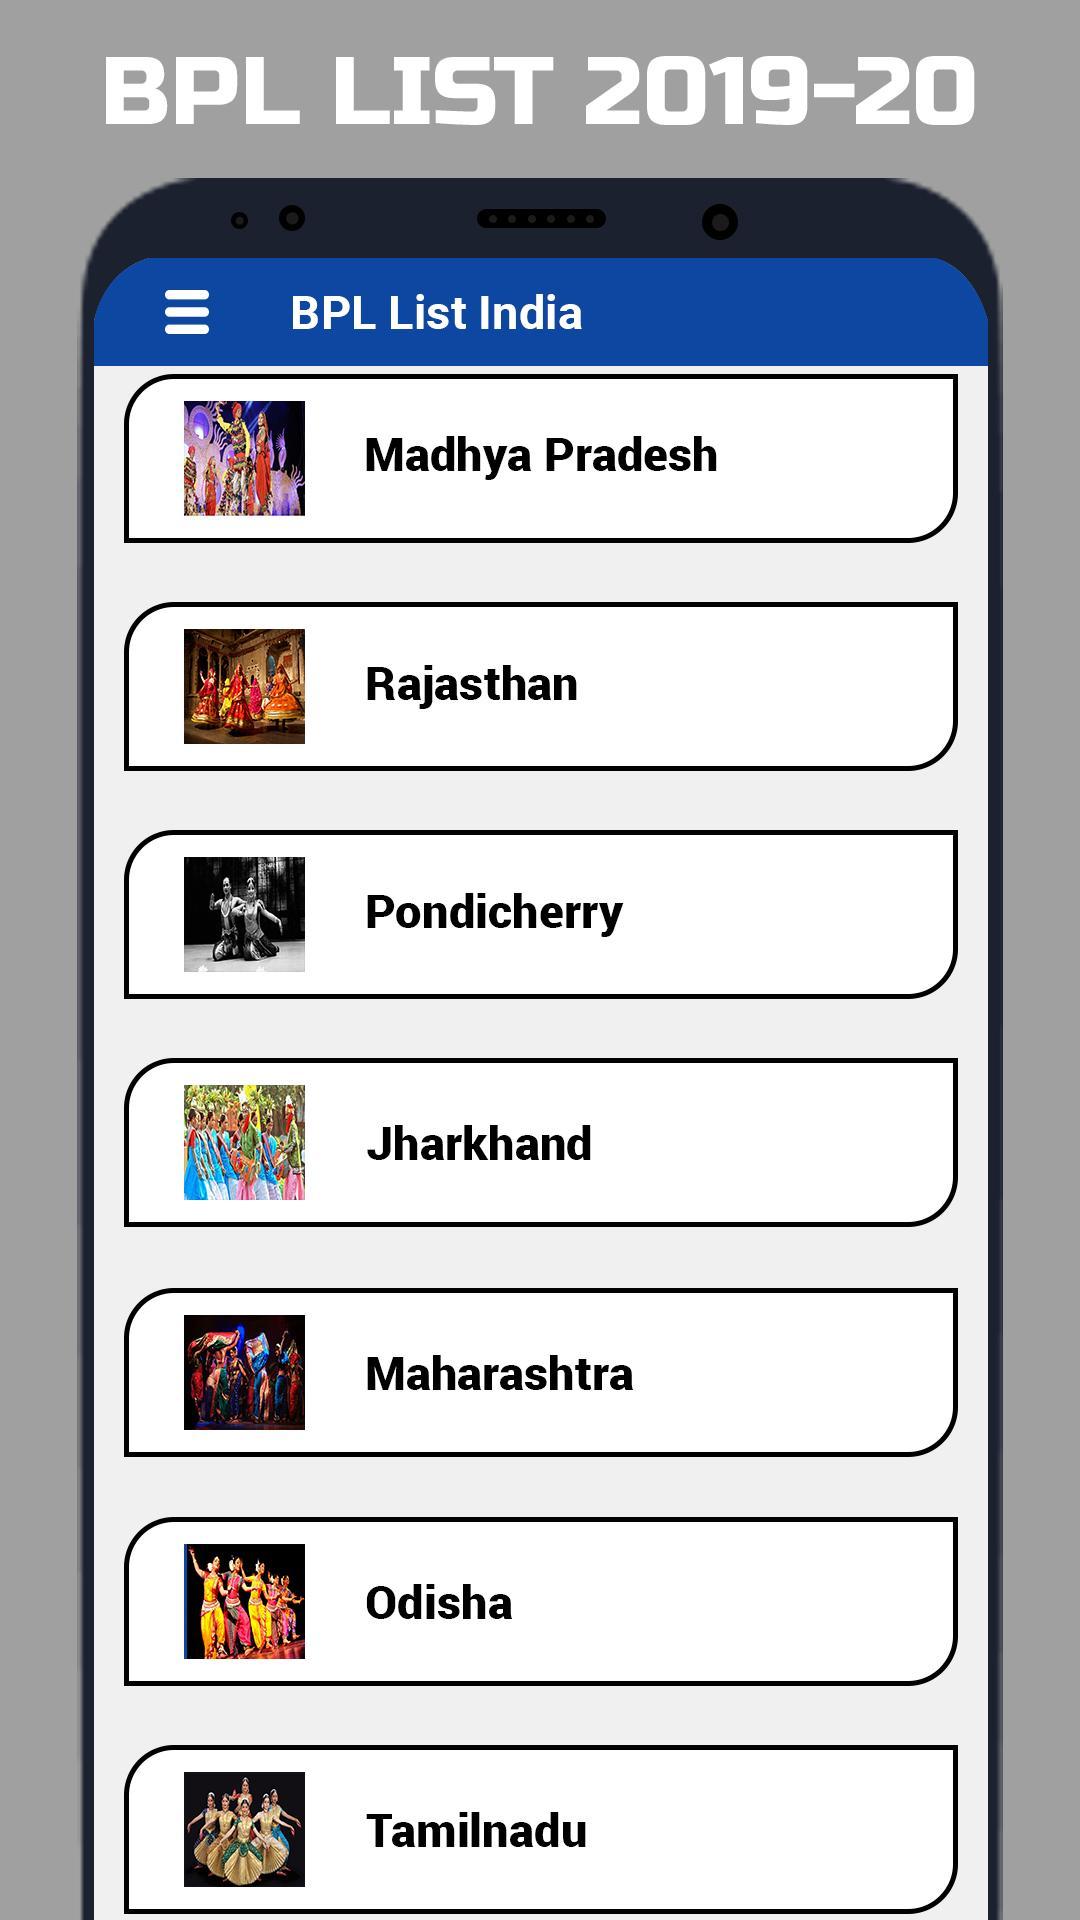 Top Five Bpl List 2019 Rajasthan - Circus